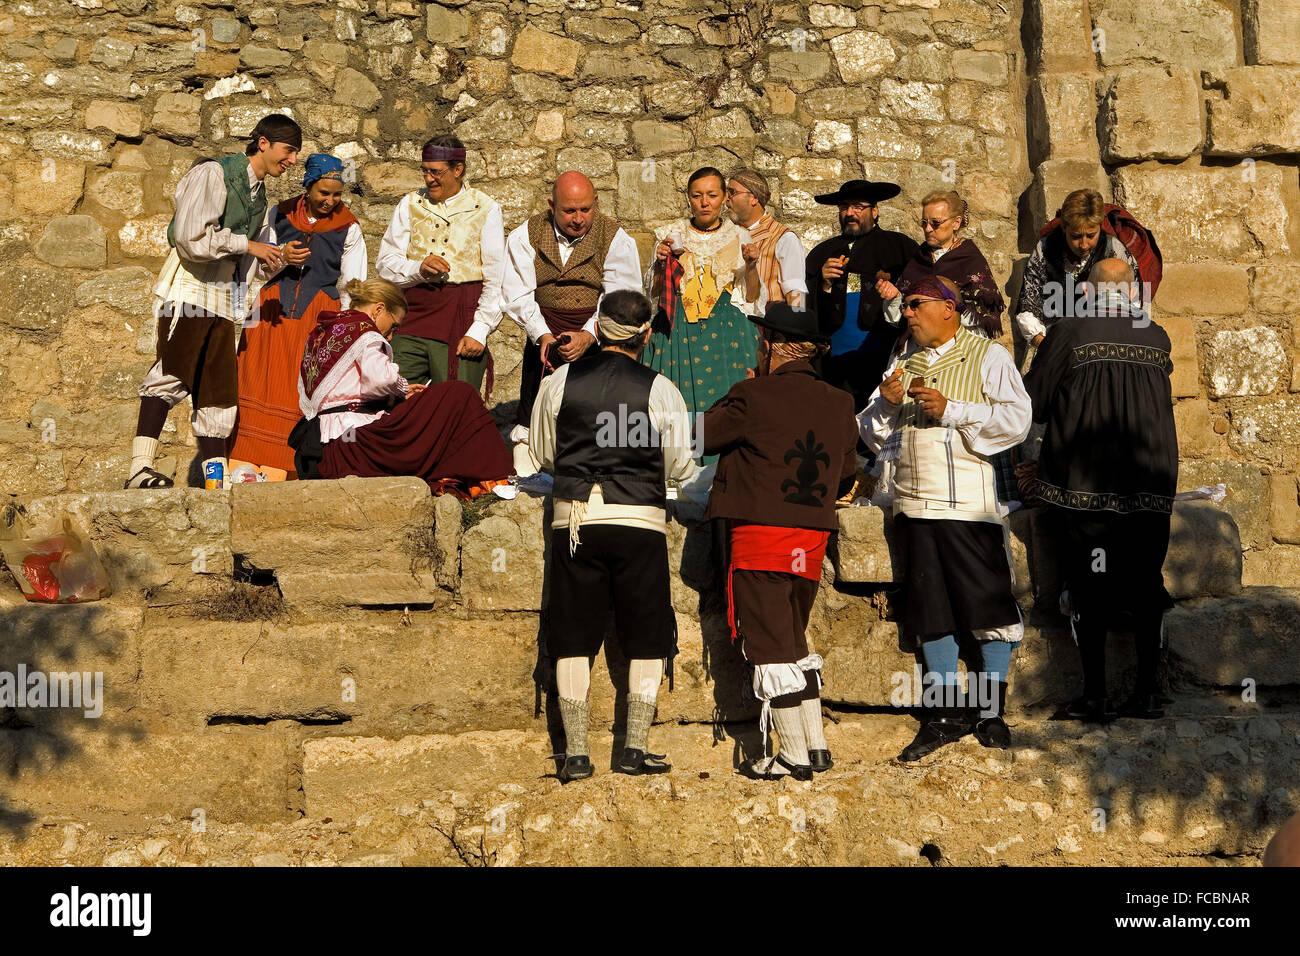 Zaragoza, Aragón, Spain: Roman wall on October 12 during the celebration of El Pilar in roman wall - Stock Image